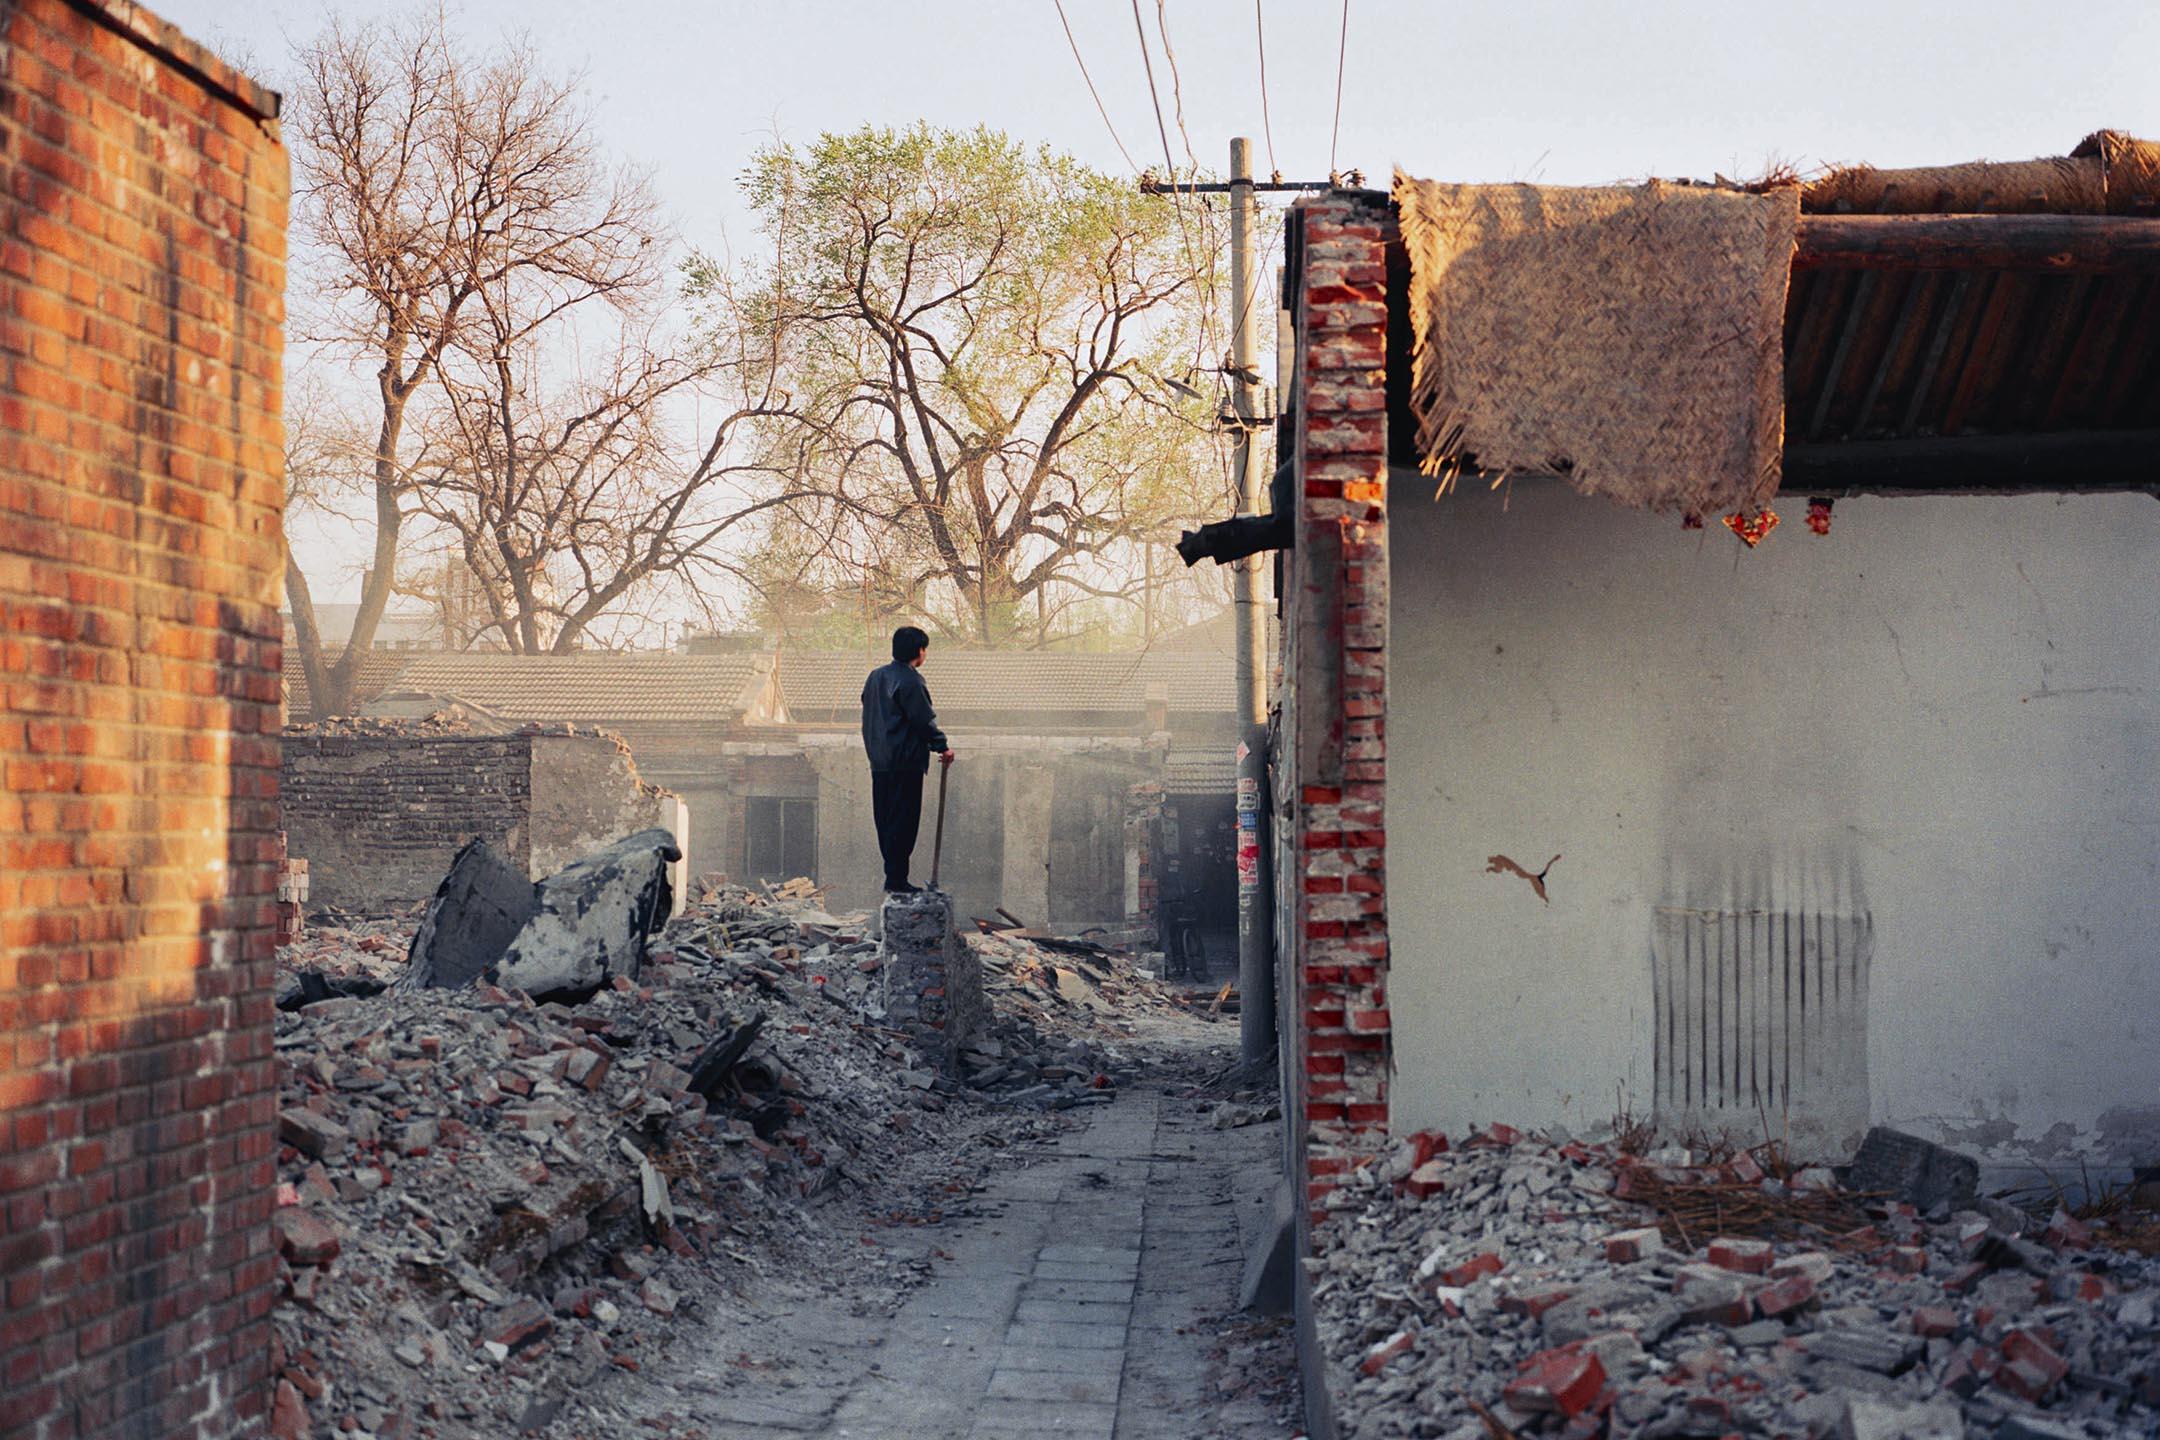 2007年07月25日,中國被拆毀的建築物。 攝:Daniel Traub/Avalon via Getty Images